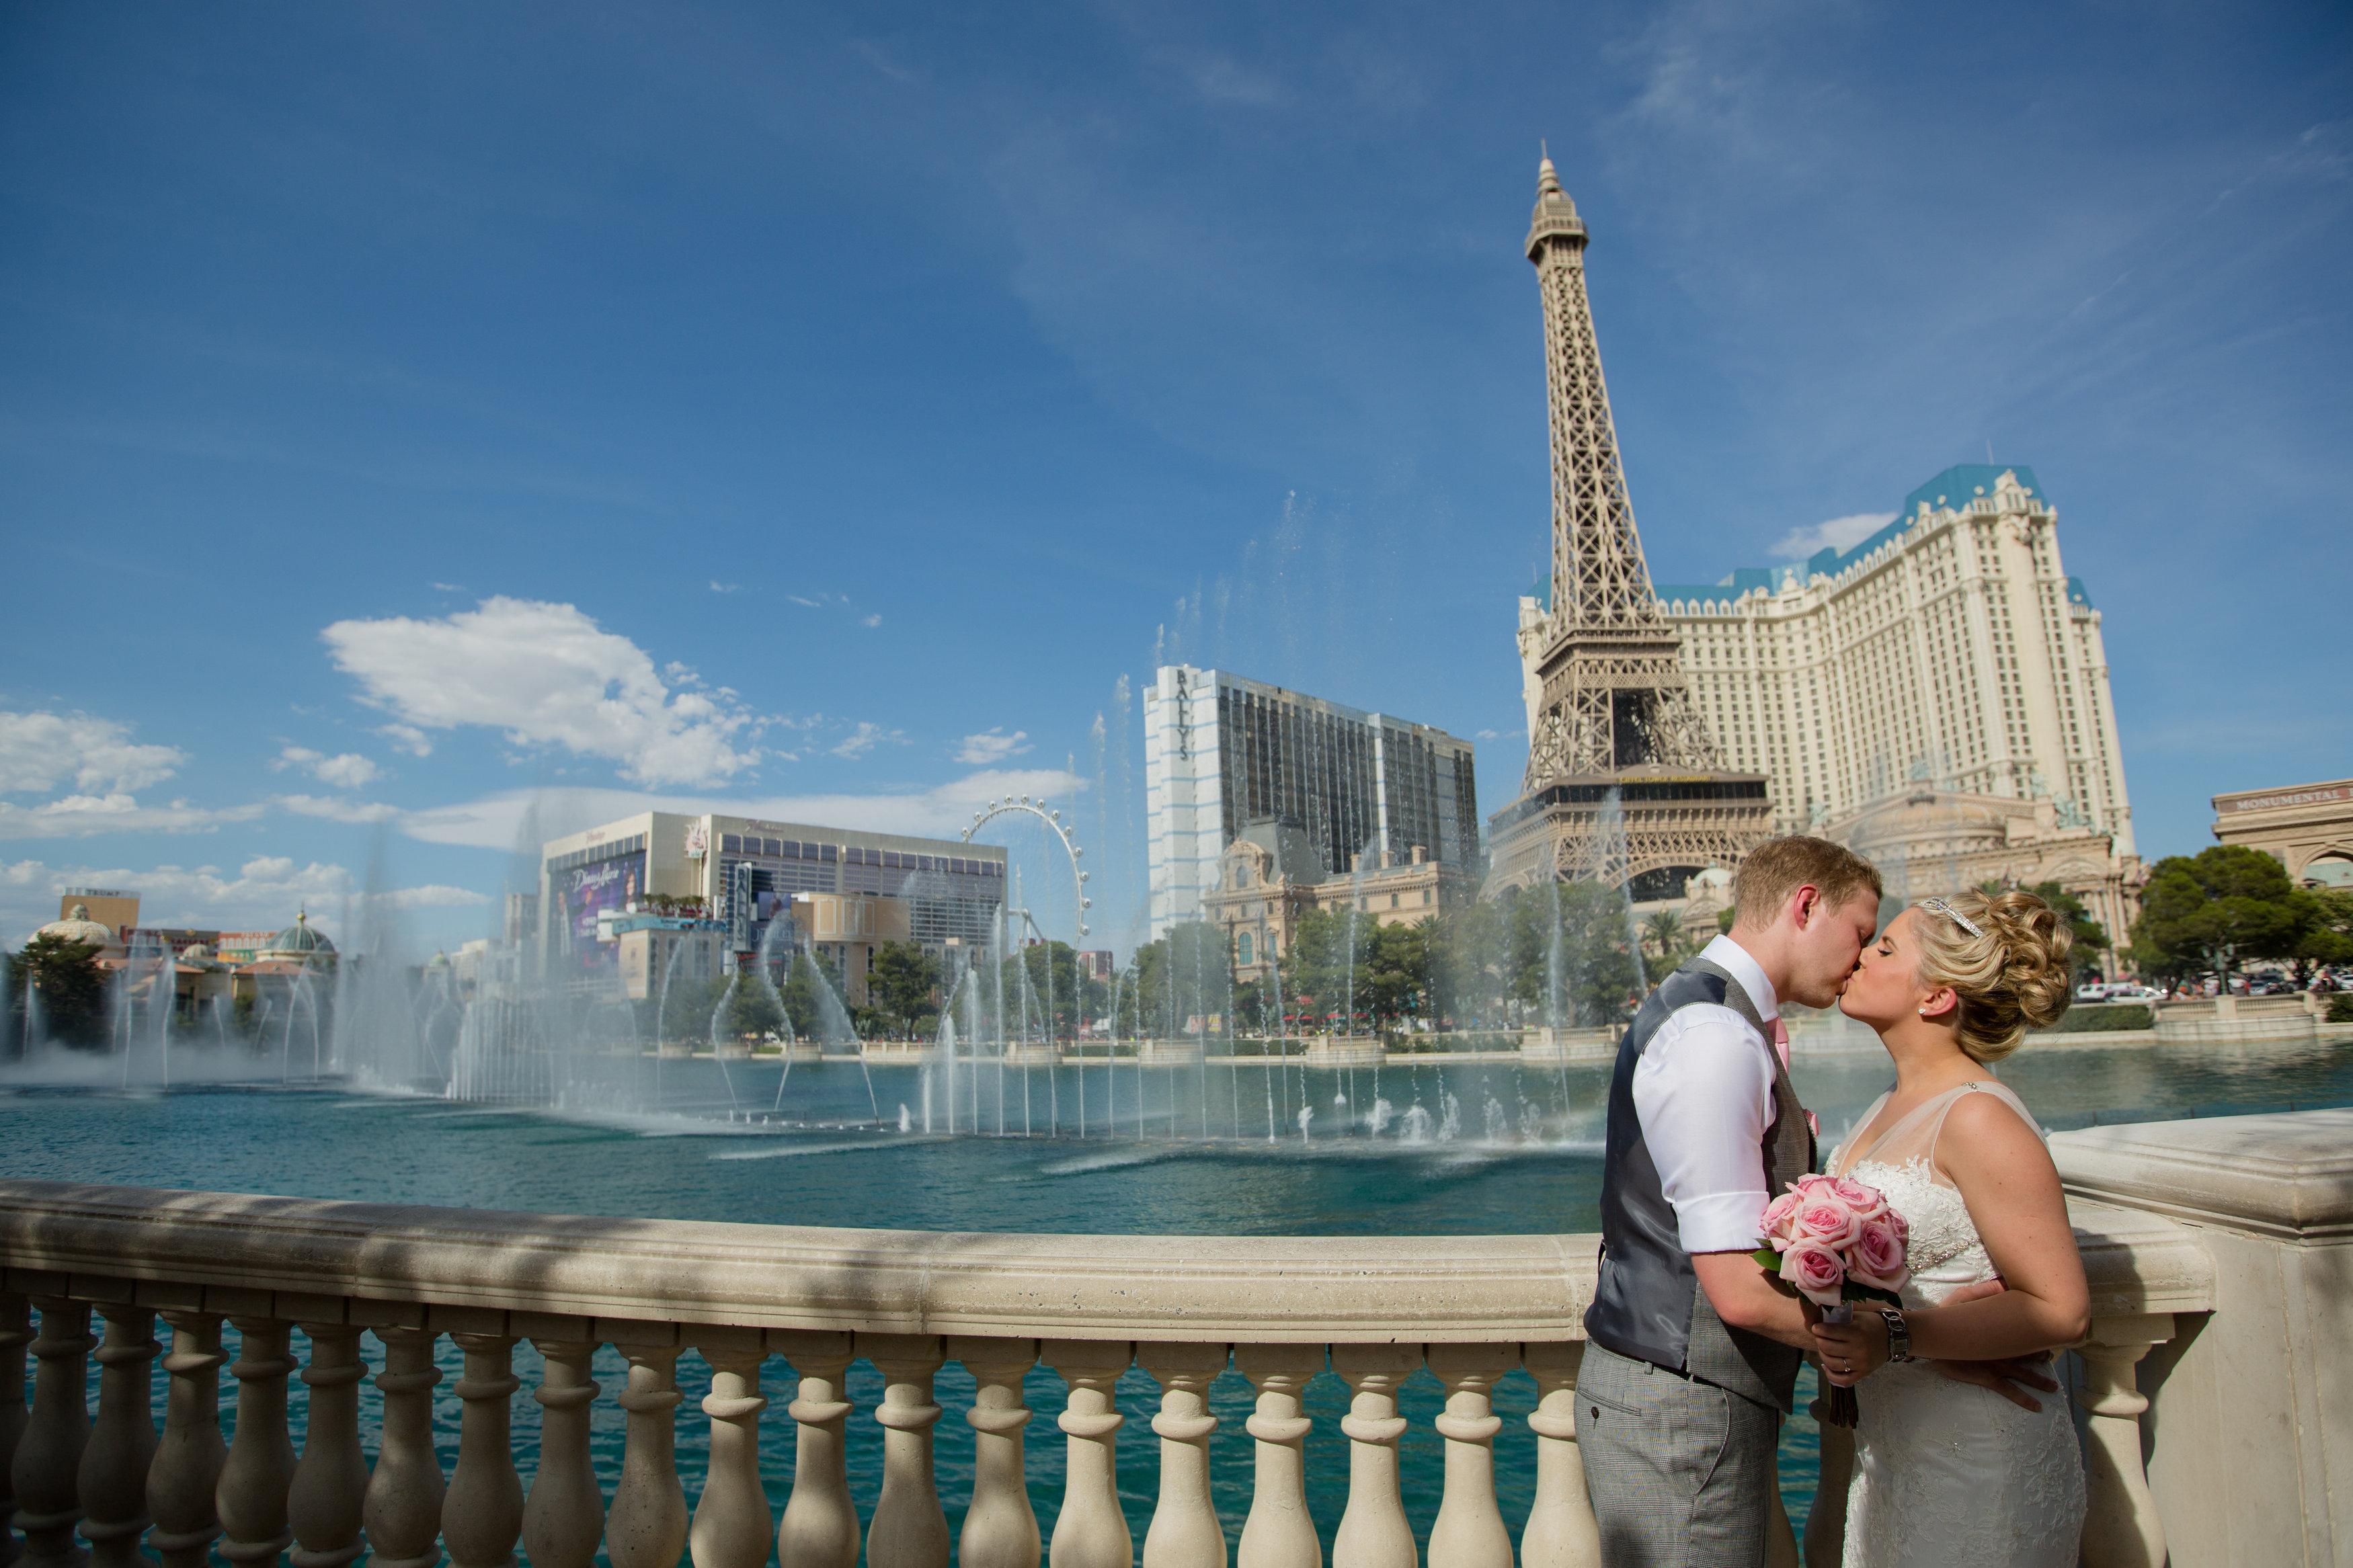 Las Vegas Wedding Videographers, Platinum Hotel Weddings, Retro Bakery, All Night Long DJ, Mindy Bean Photography, Retro Bakery